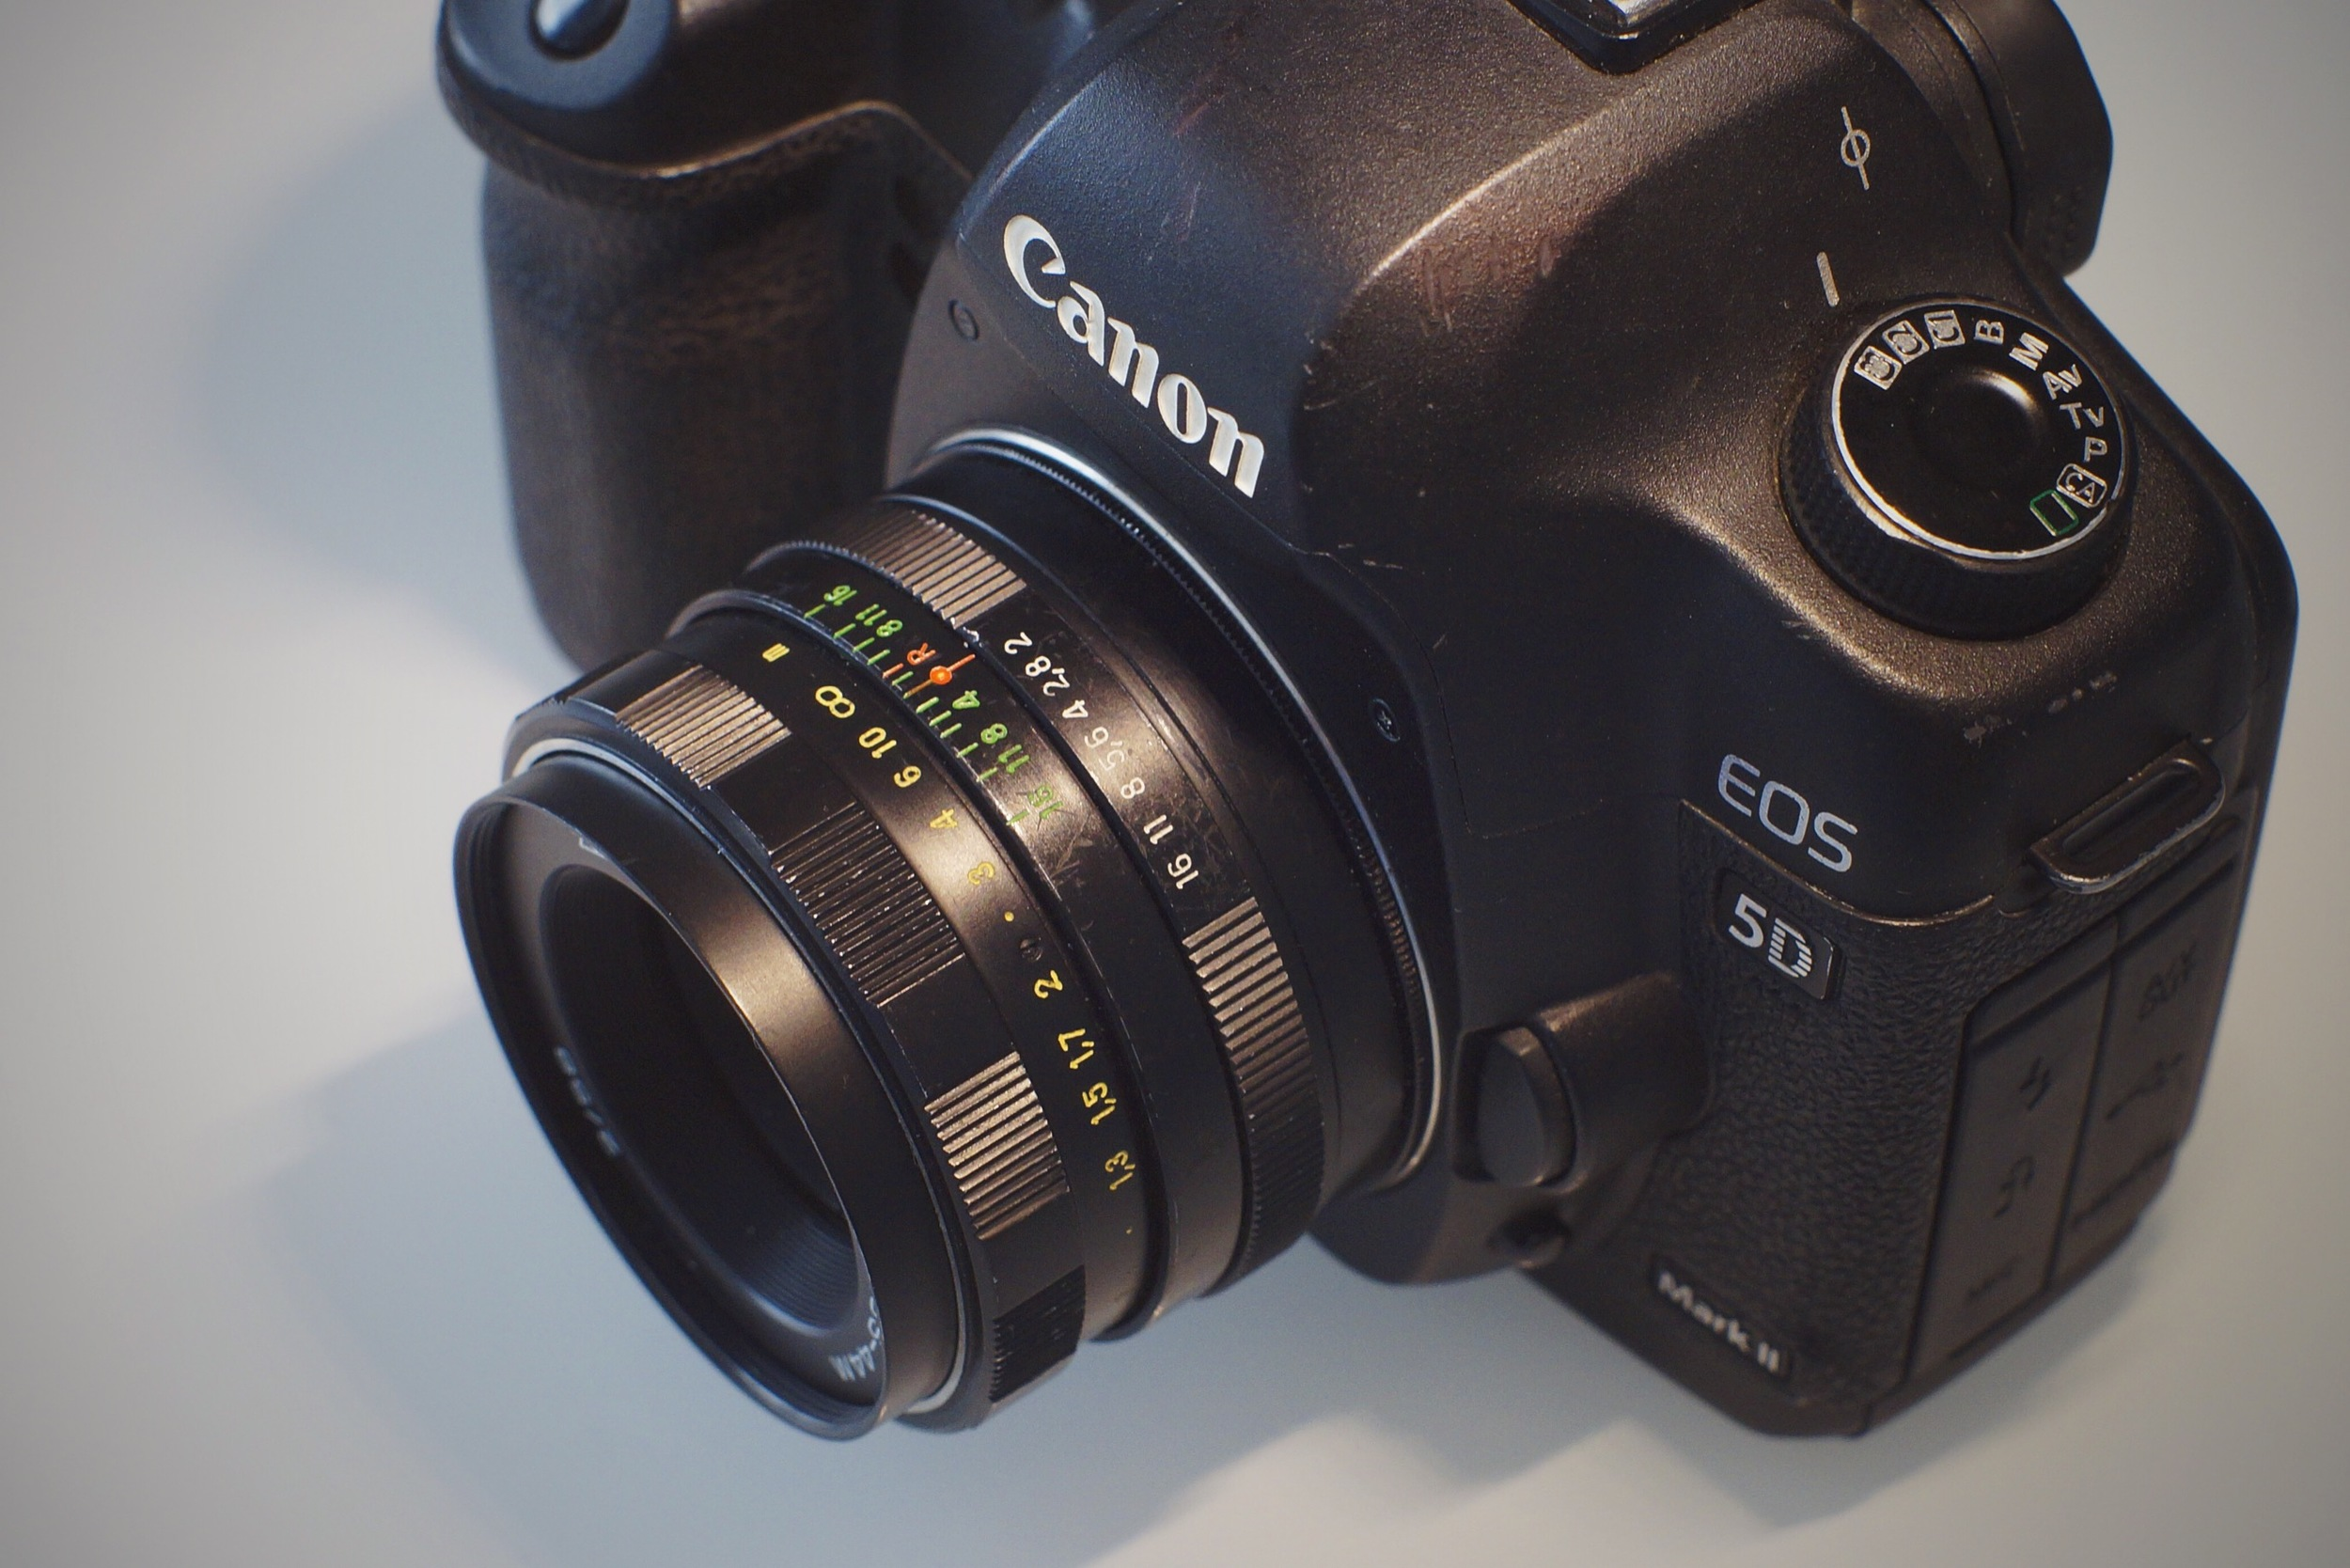 Helios 58mm f2 0 SLR lens - Modified with Anamorphic Bokeh, Flare/Streak  (Canon mount) — Vid-Atlantic Media Productions